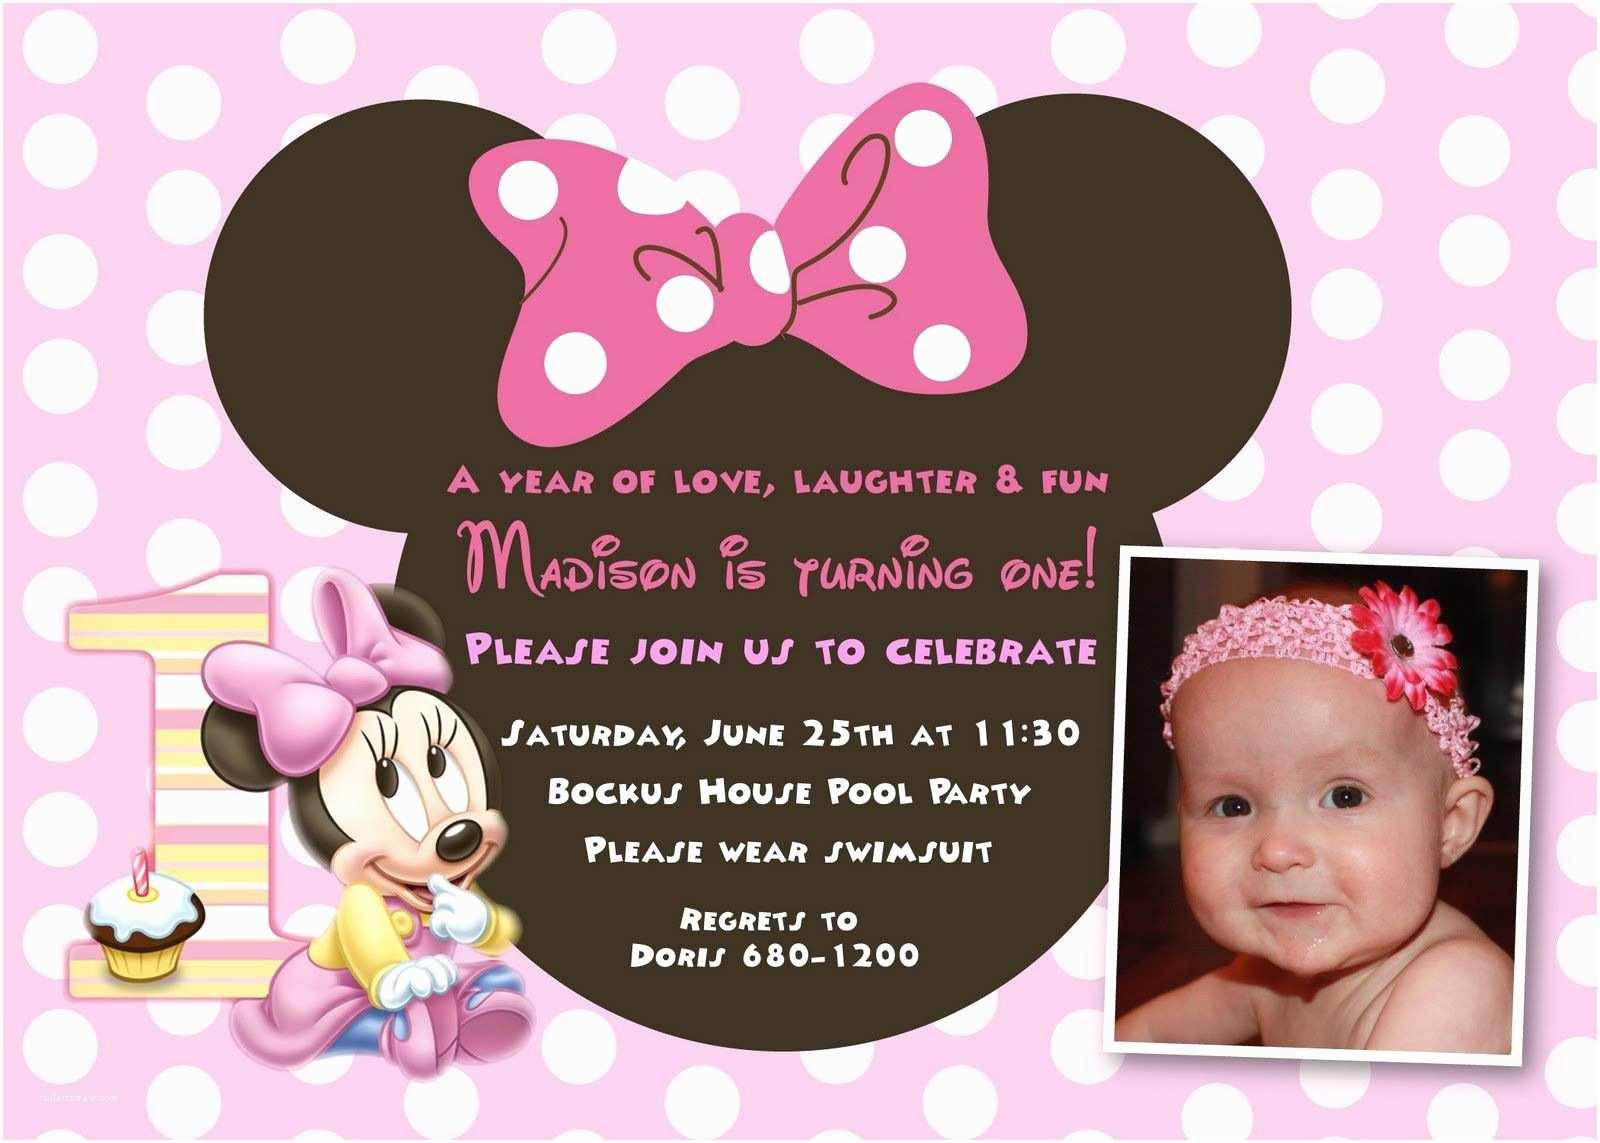 Minnie Mouse Birthday Invitation Cool Minnie Mouse First Birthday Invitations Designs